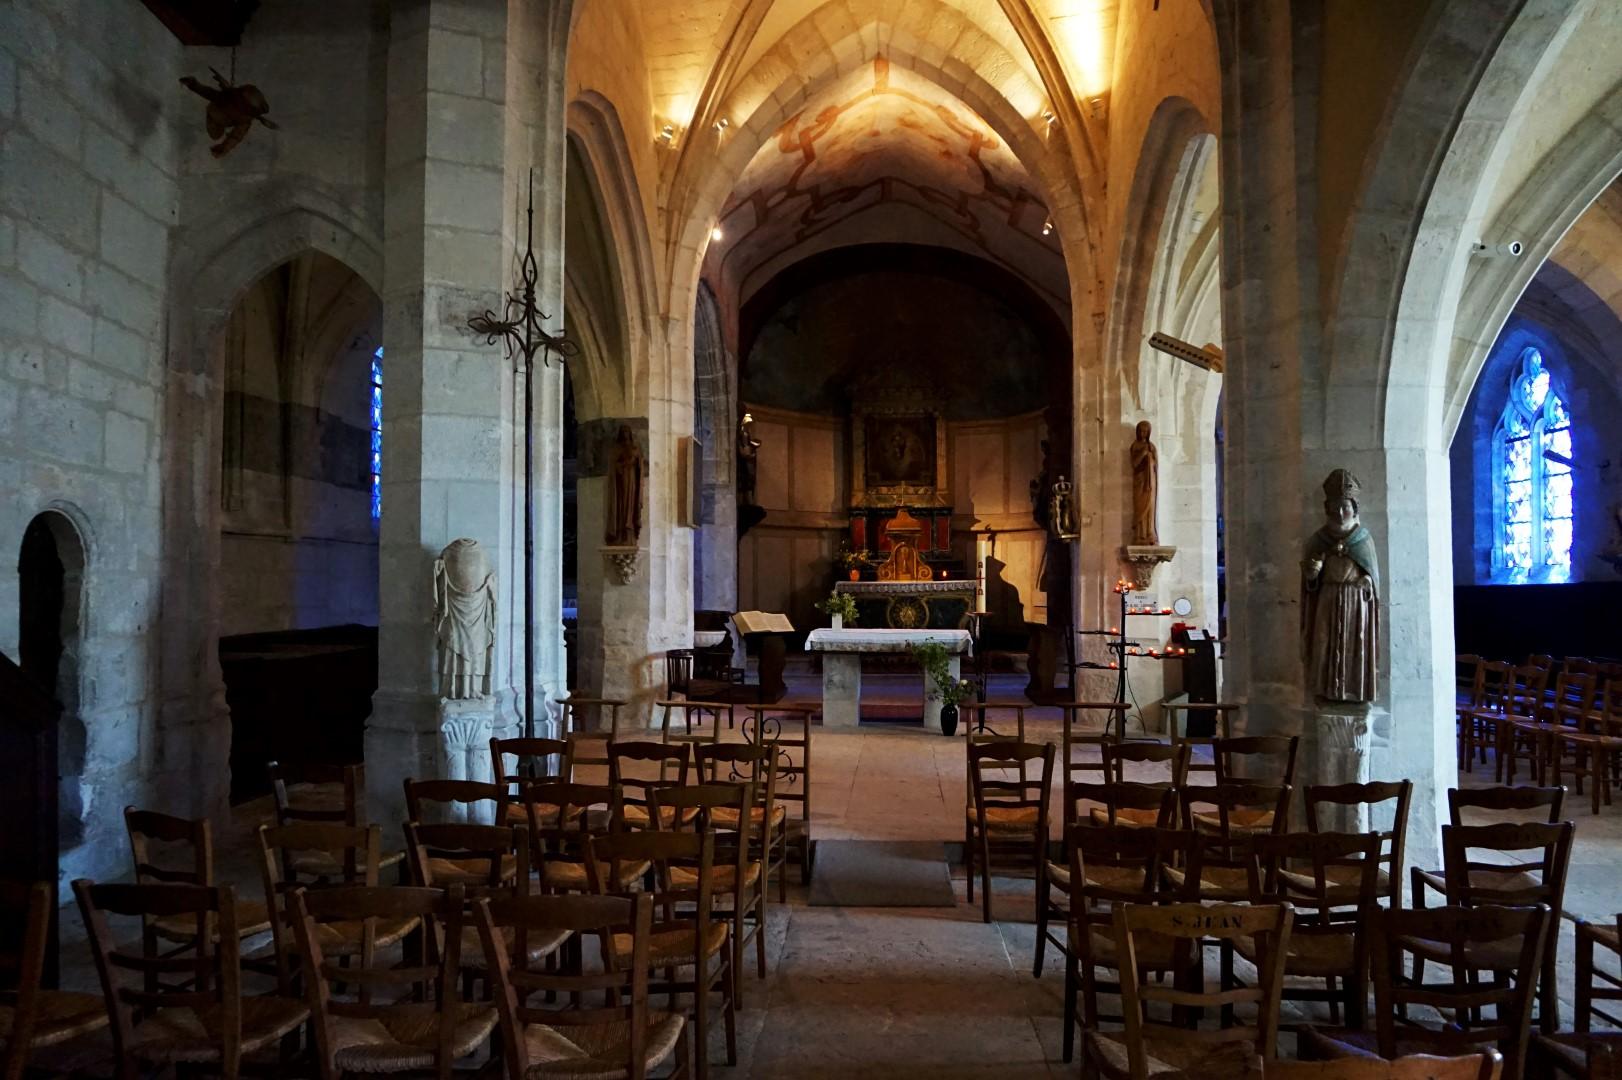 Balade dans Giverny - Eglise Sainte-Radegonde